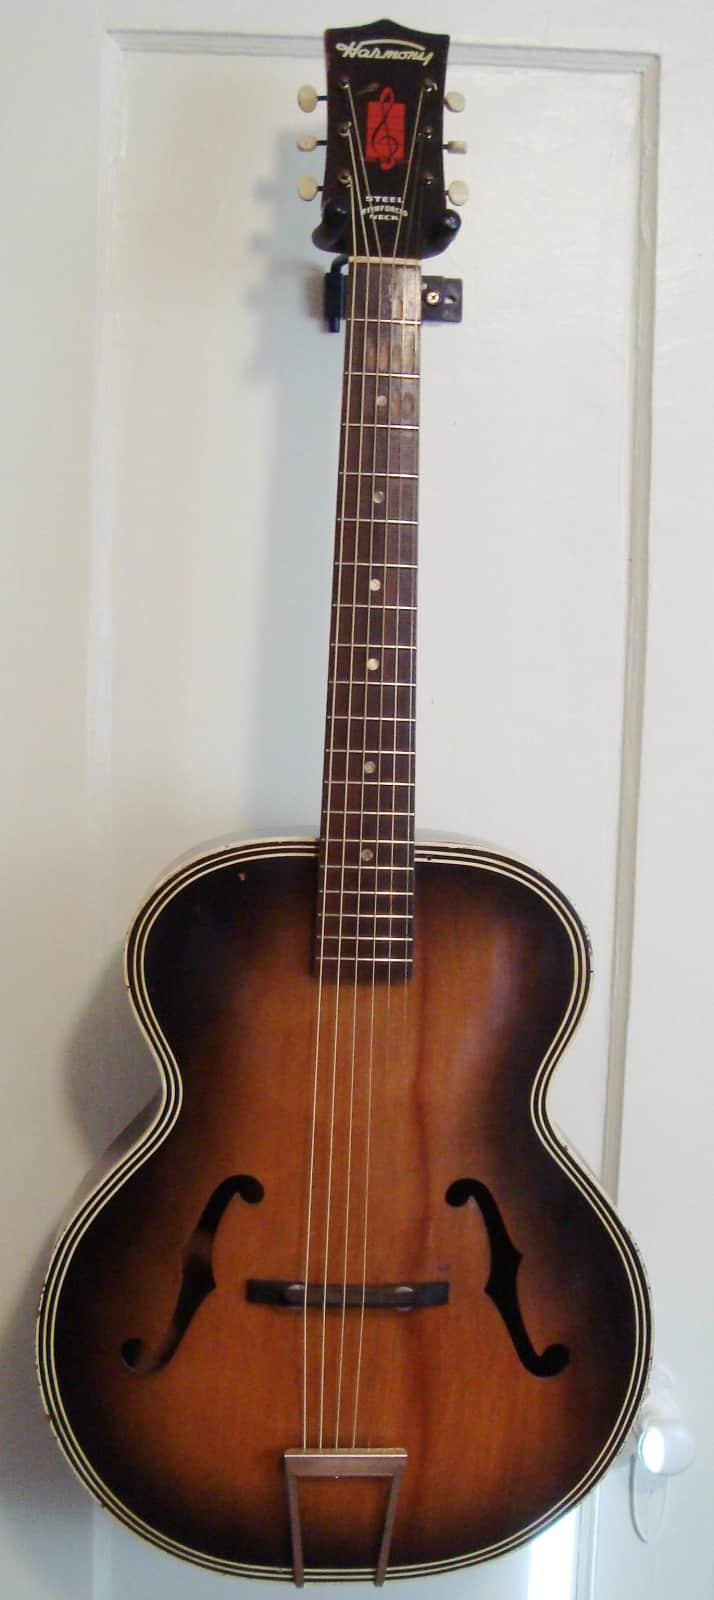 1961 harmony h1213 archtop guitar reverb. Black Bedroom Furniture Sets. Home Design Ideas